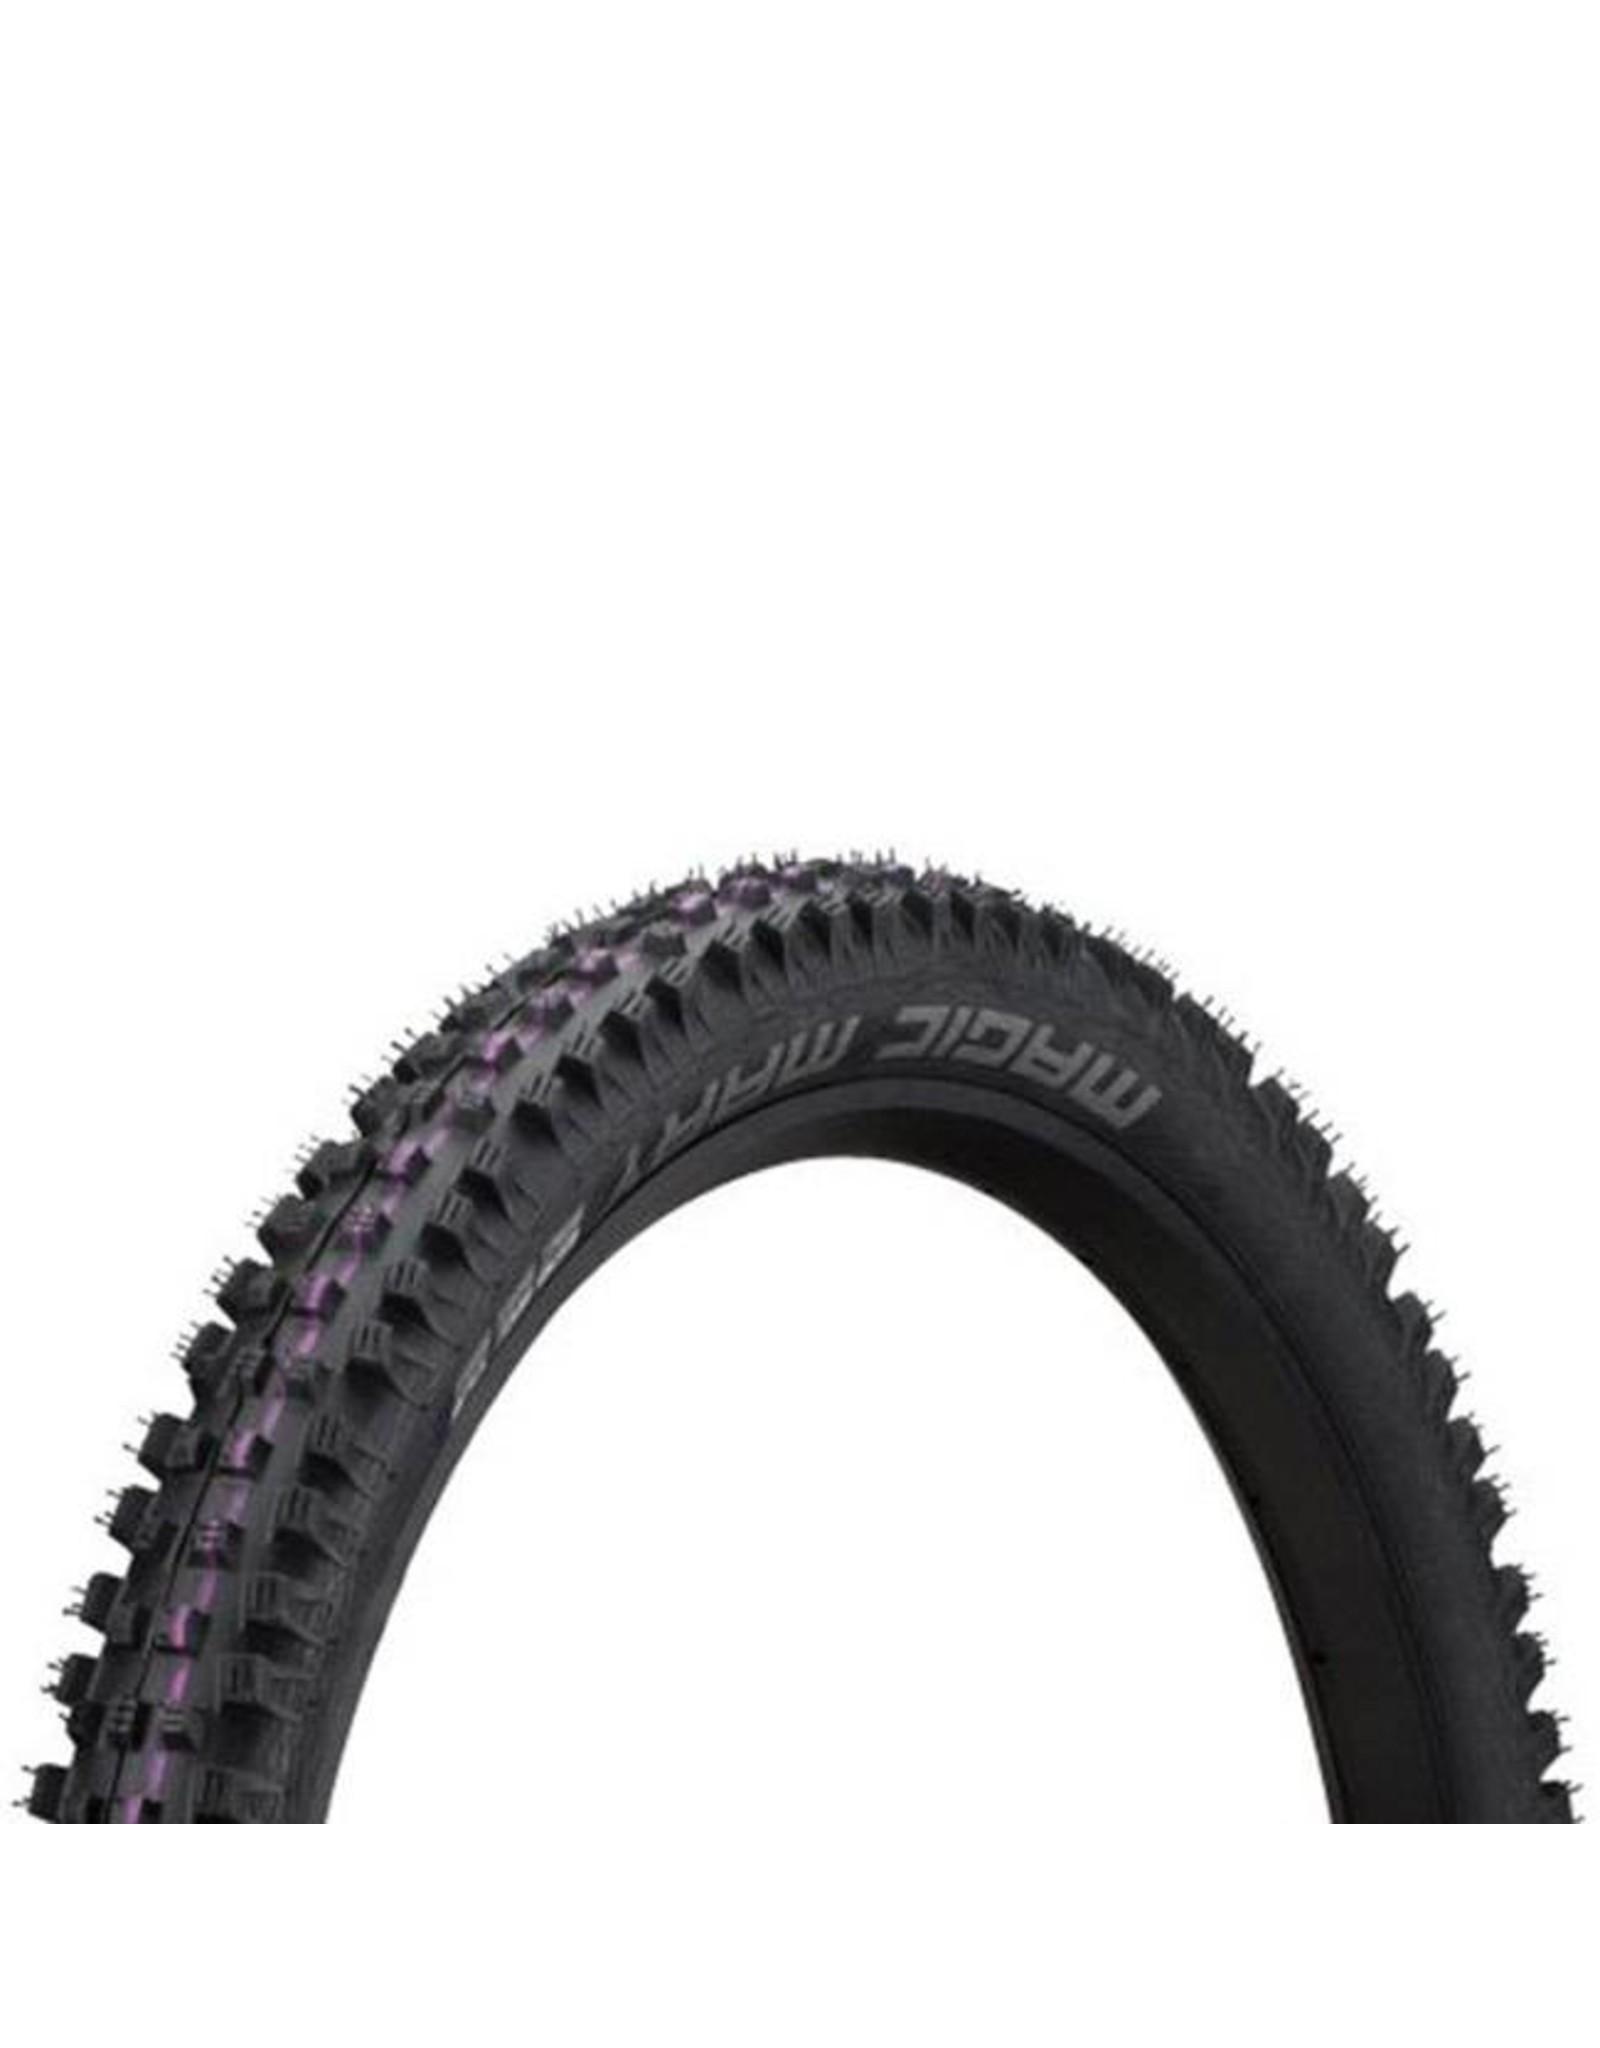 "Schwalbe Schwalbe Magic Mary Tire: 27.5 x 2.35"", Folding Bead, Evolution Line, Addix Ultra Soft Compound, Super Gravity, Tubeless Easy, Black"